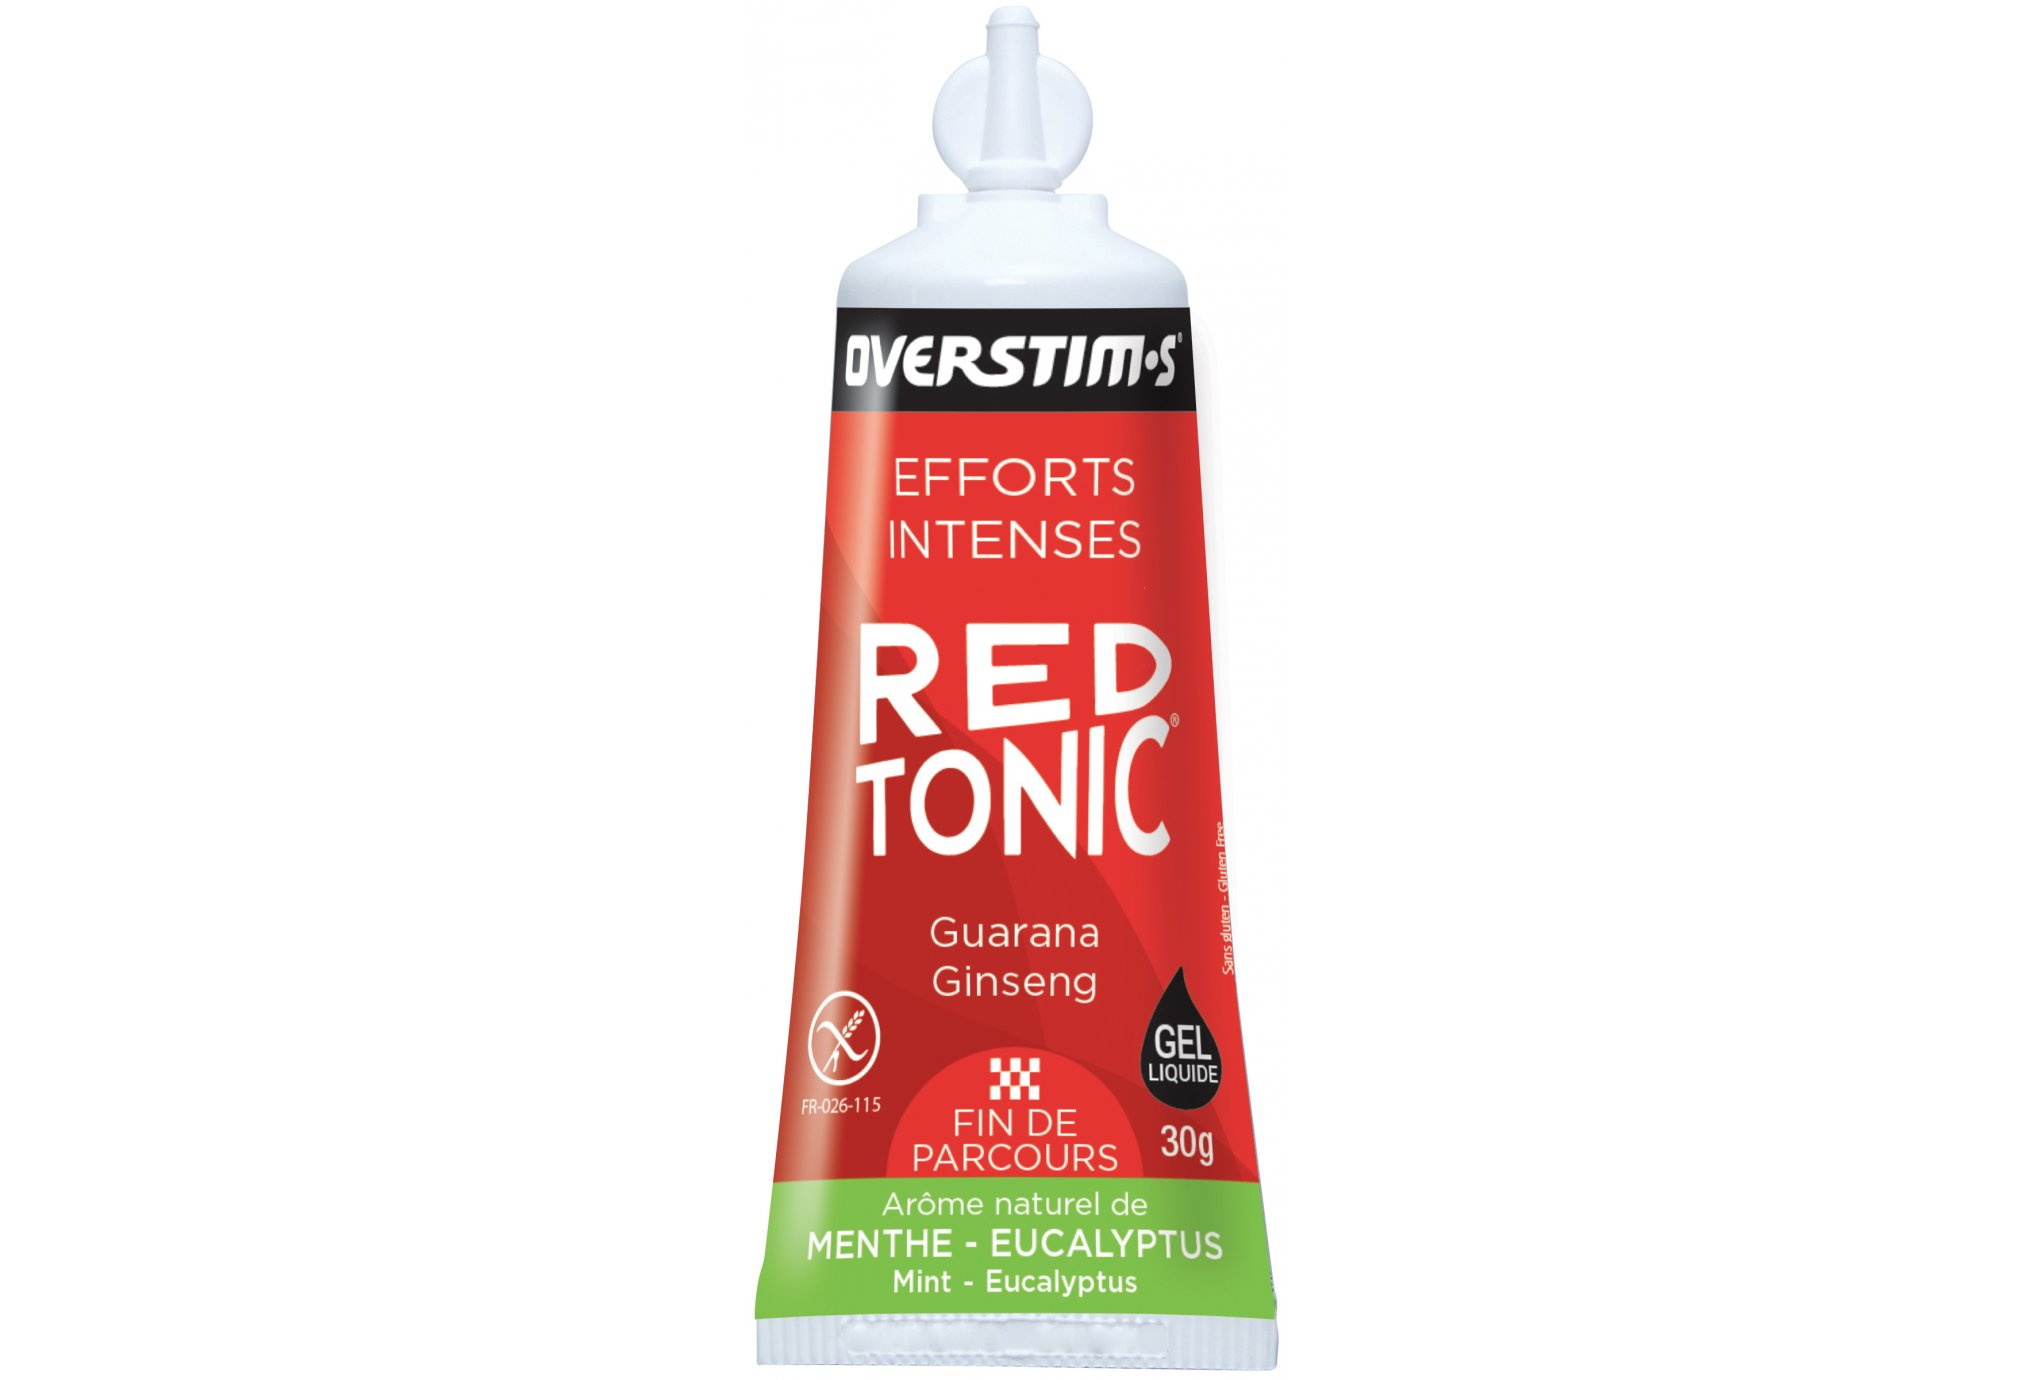 OVERSTIMS Red Tonic Sprint Air Liquide - menthe eucalyptus Diététique Gels